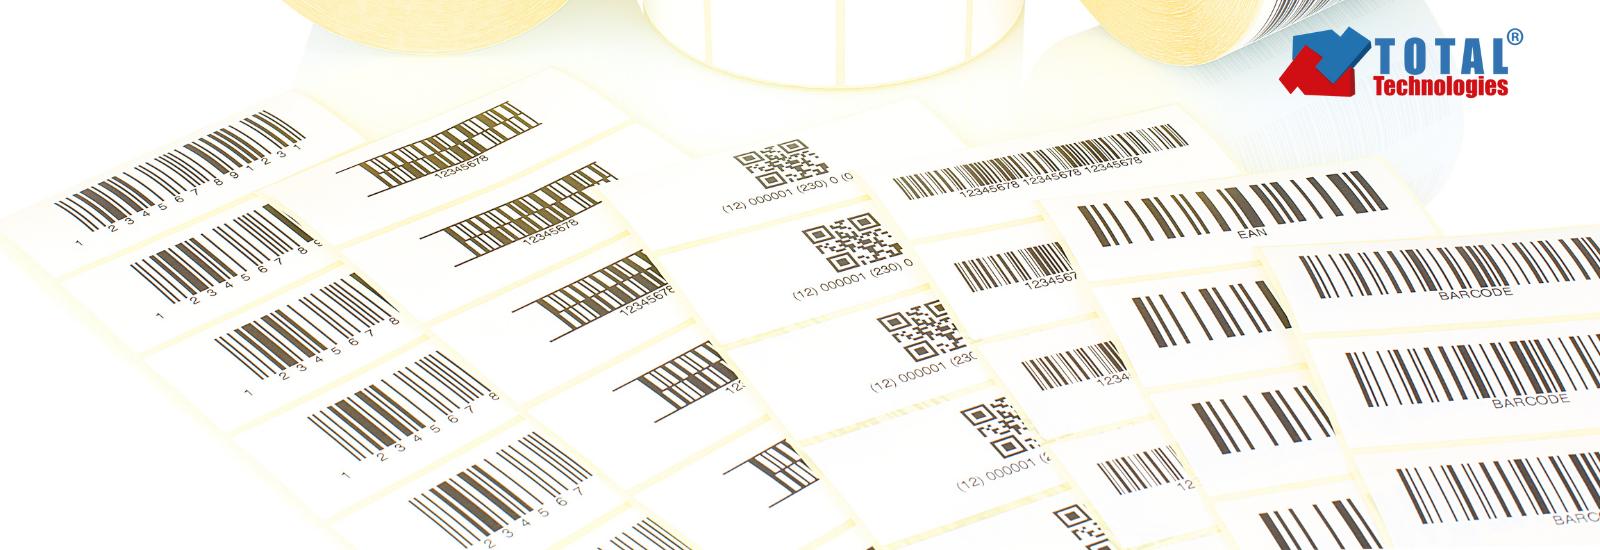 Soluție pentru gestionarea etichetelor - BarTender